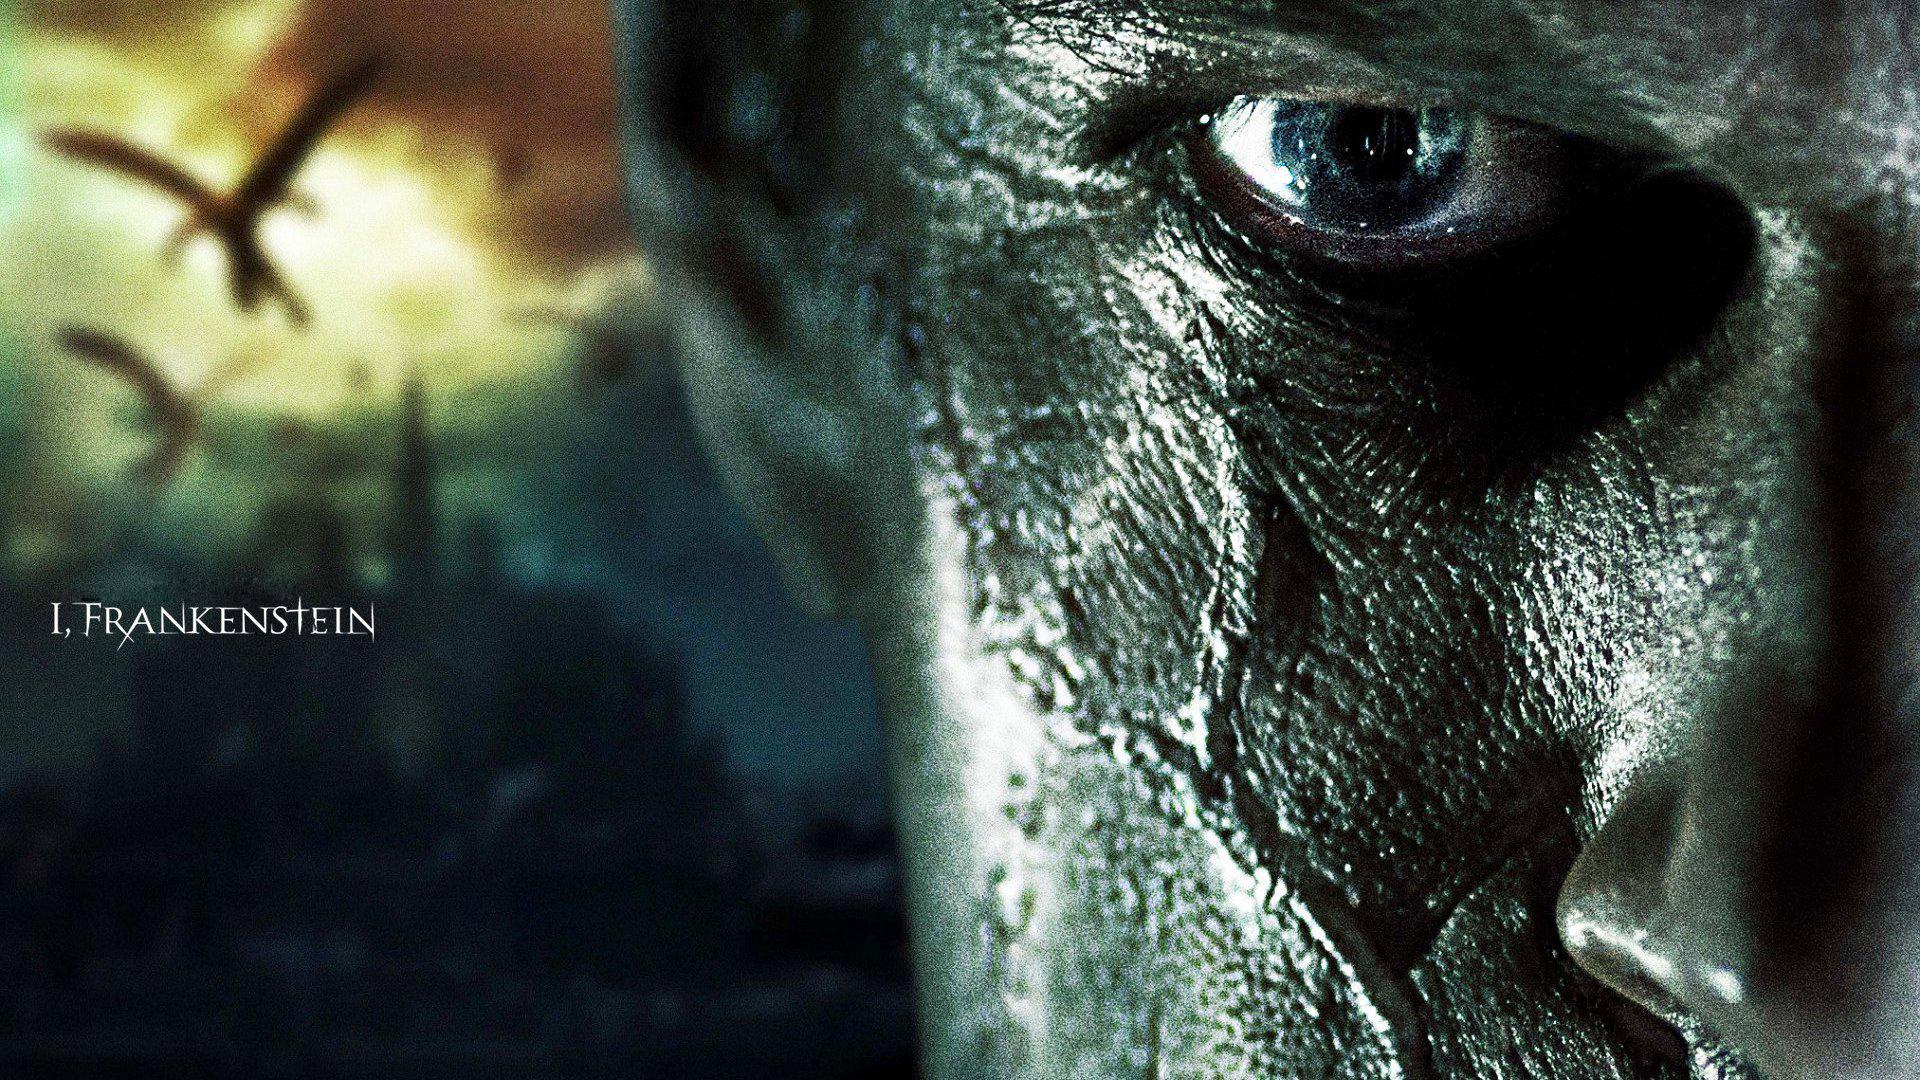 Frankenstein 2014 Movie Wallpaperjpg 1920x1080